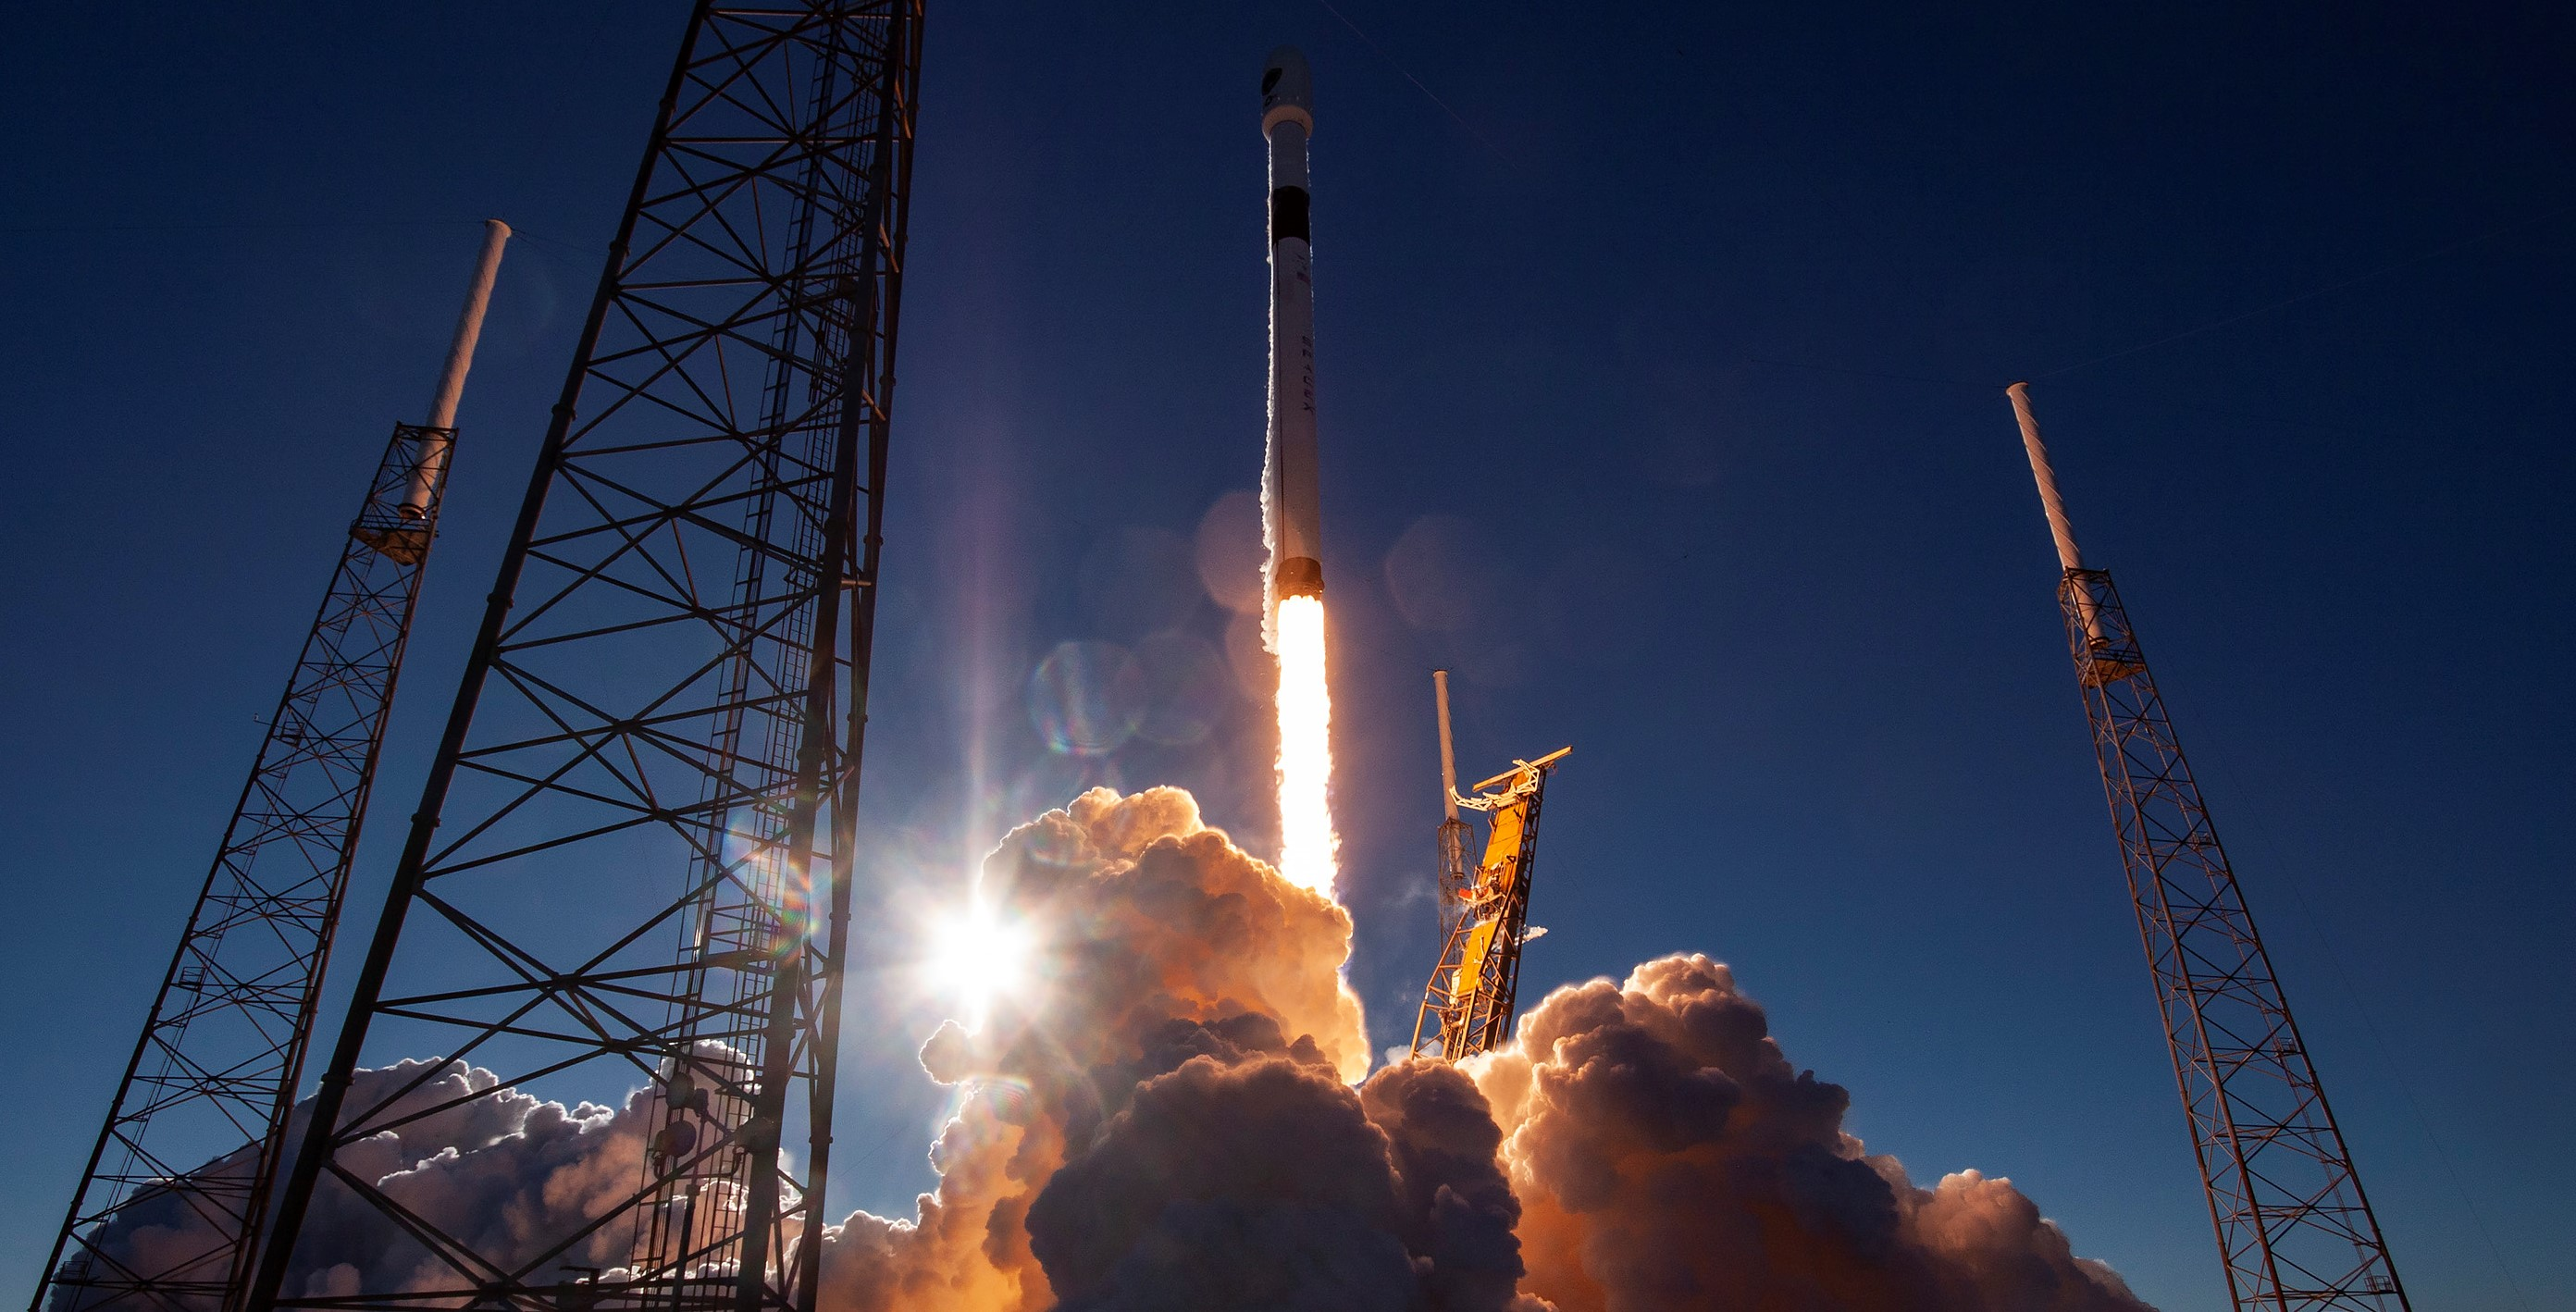 Falcon 9 B1054 GPS III SV01 liftoff (SpaceX) 5 crop 2